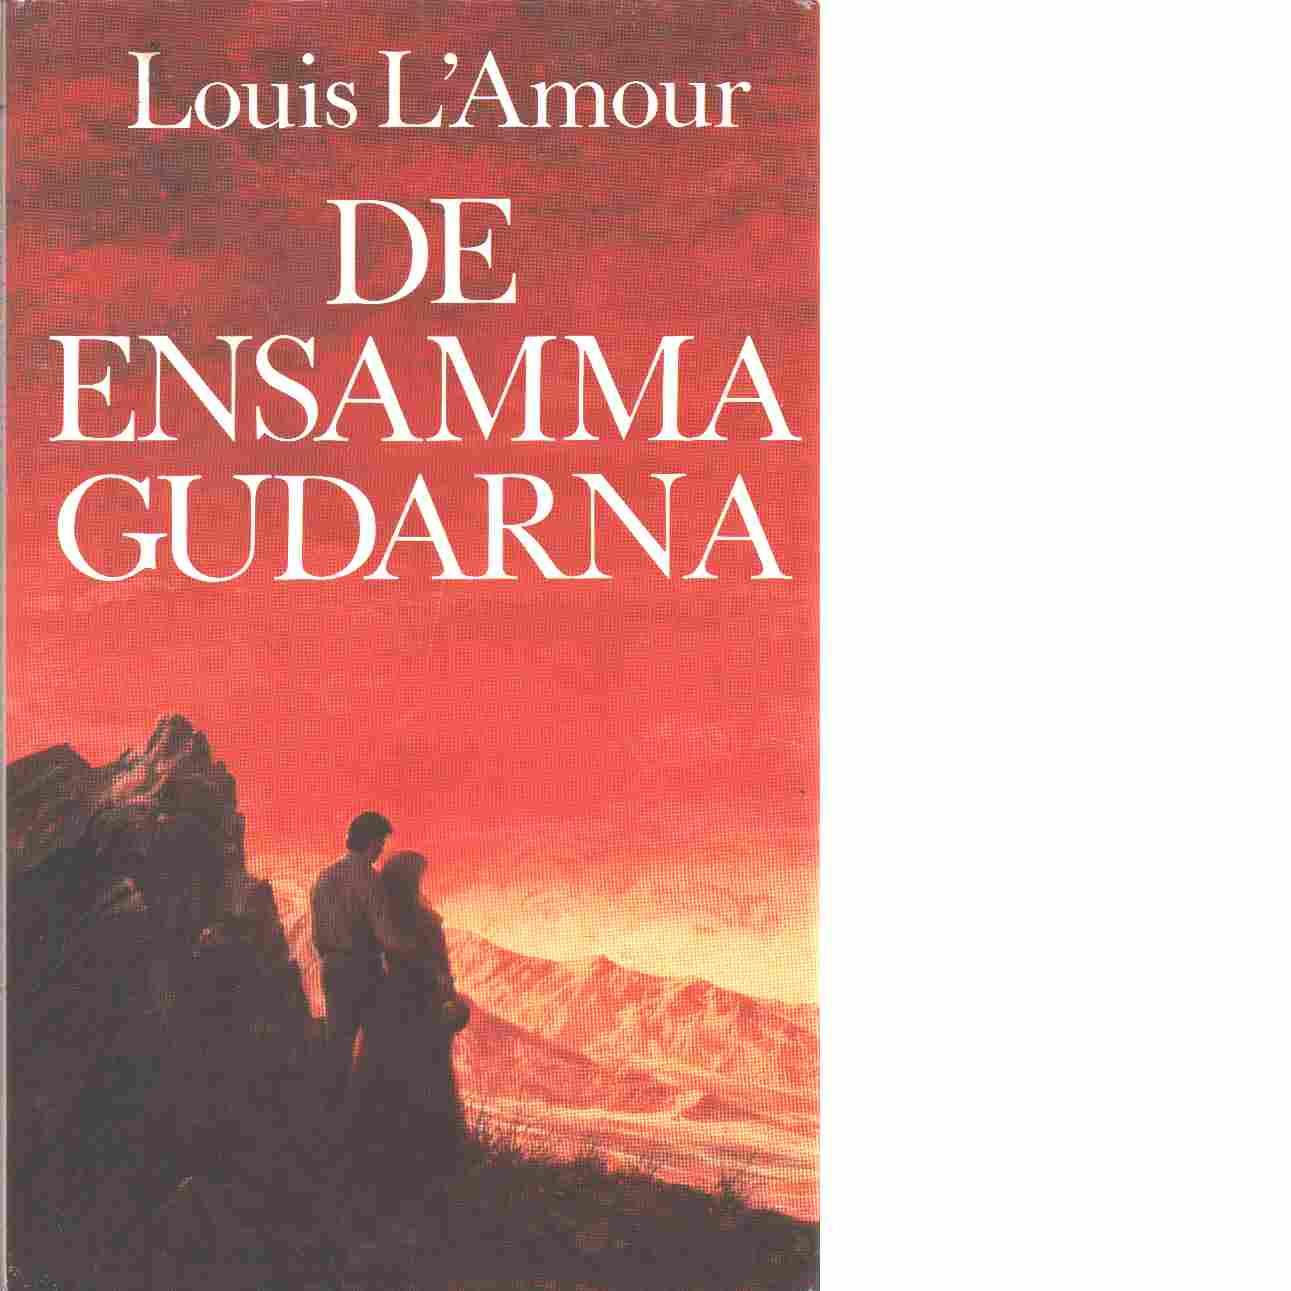 De ensamma gudarna - L'Amour, Louis